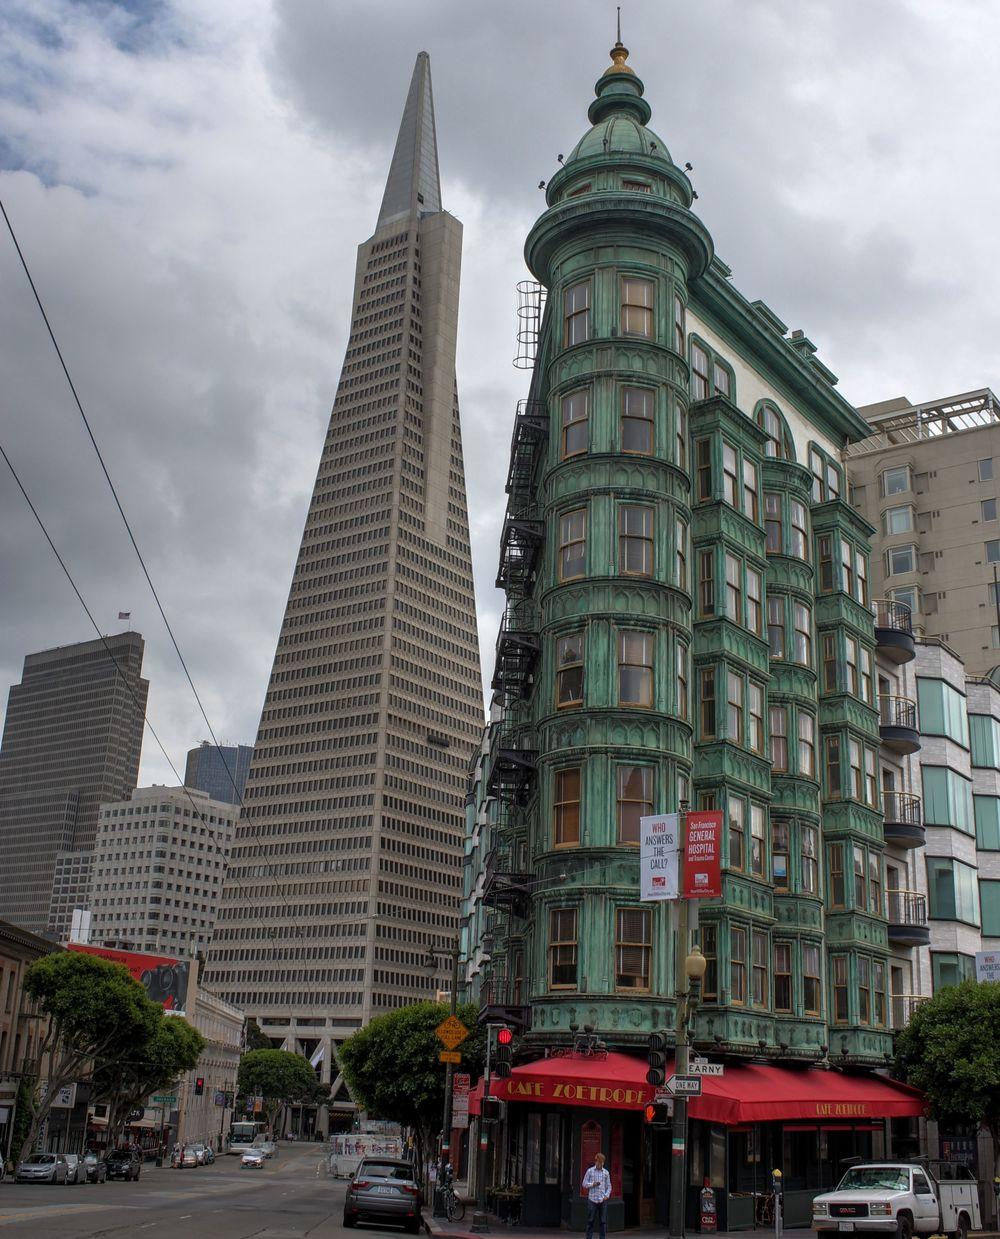 Transamerica Pyramid, San Francisco, CA, USA